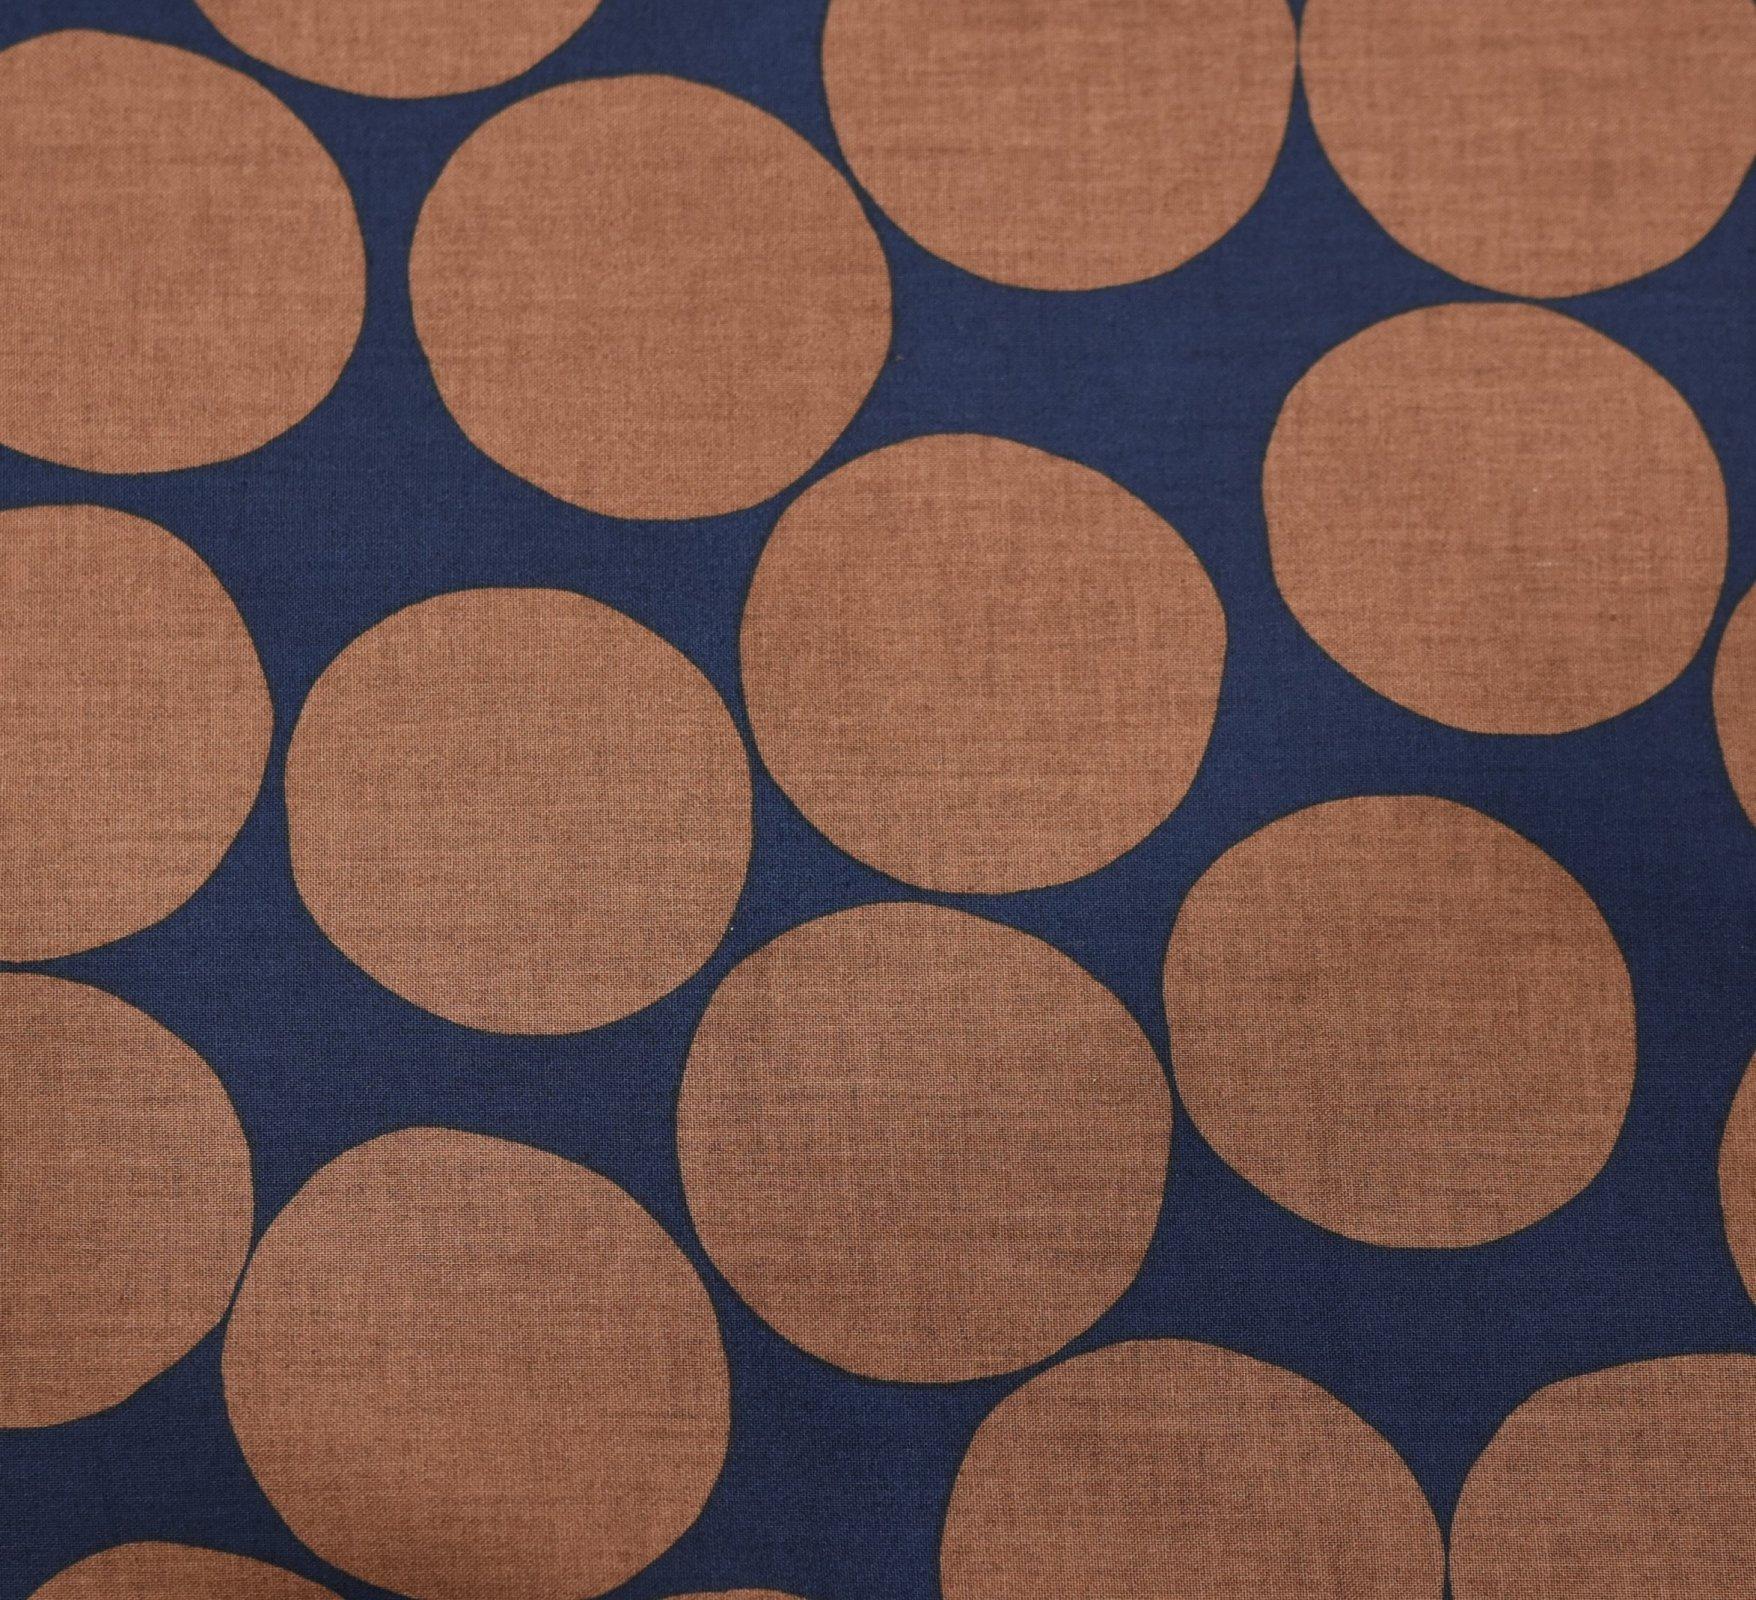 Hokkoh Fabric - Oversized Spot - Navy & Brown